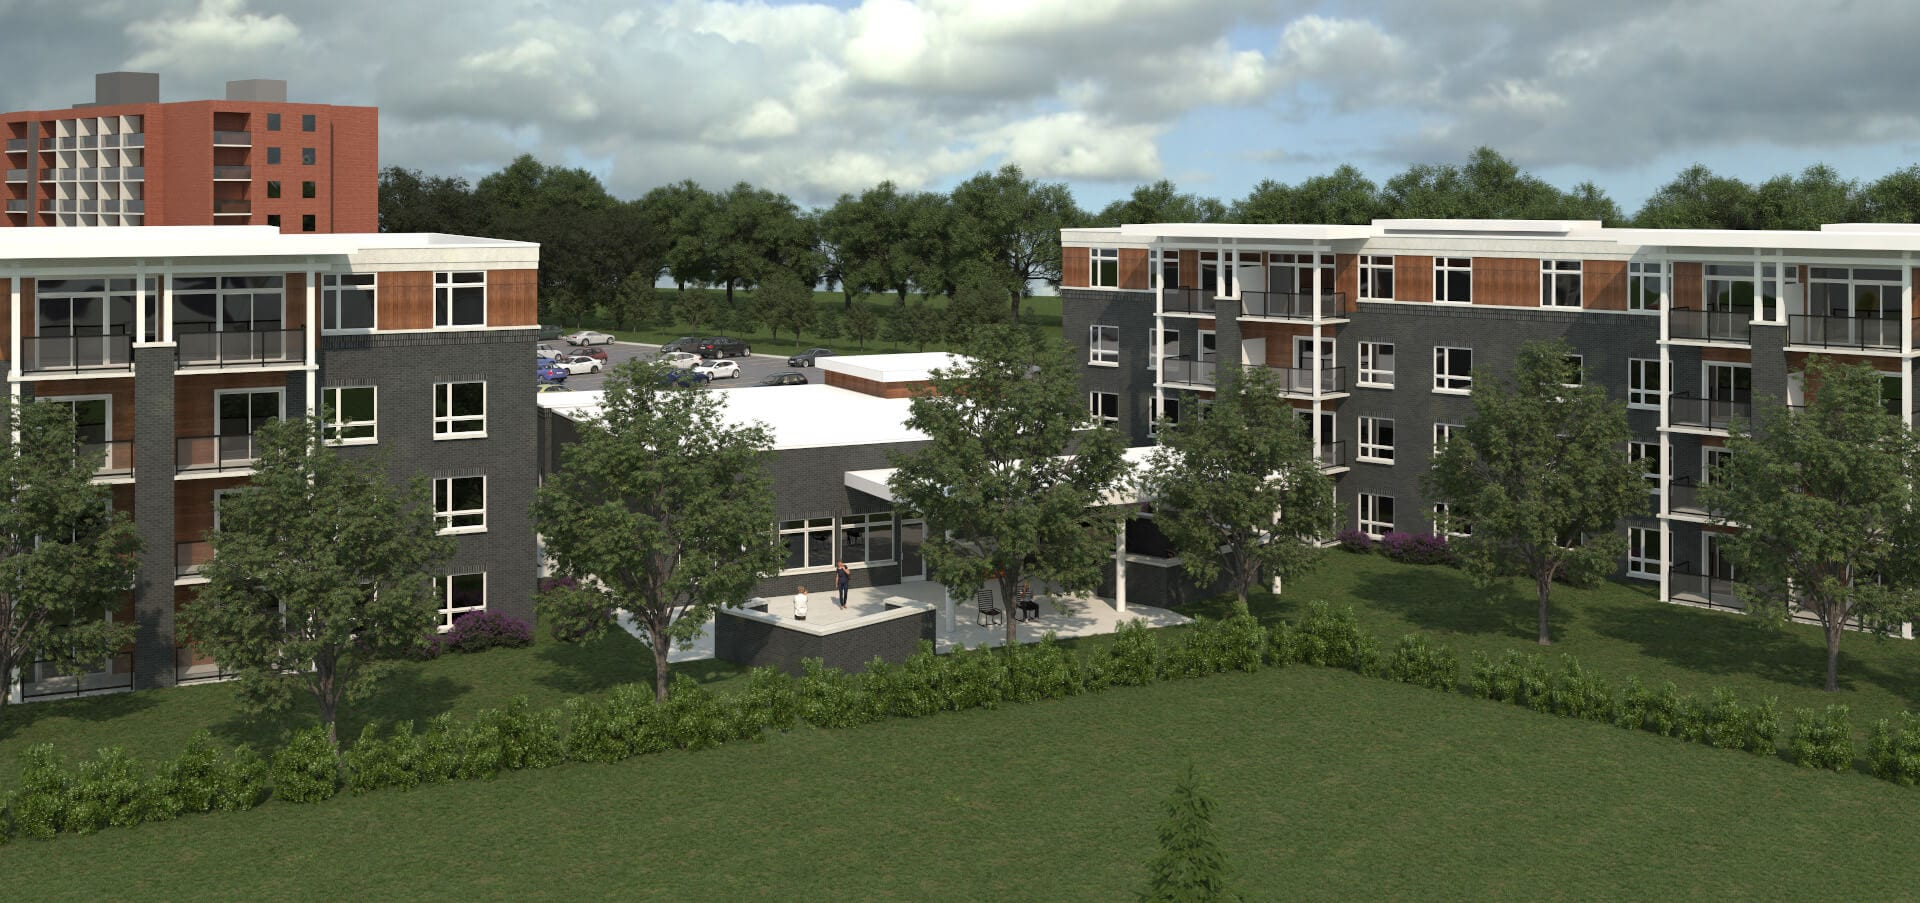 SkyDev - Southfield Park Residences, Tecumseh, Ontario Rear Rendering